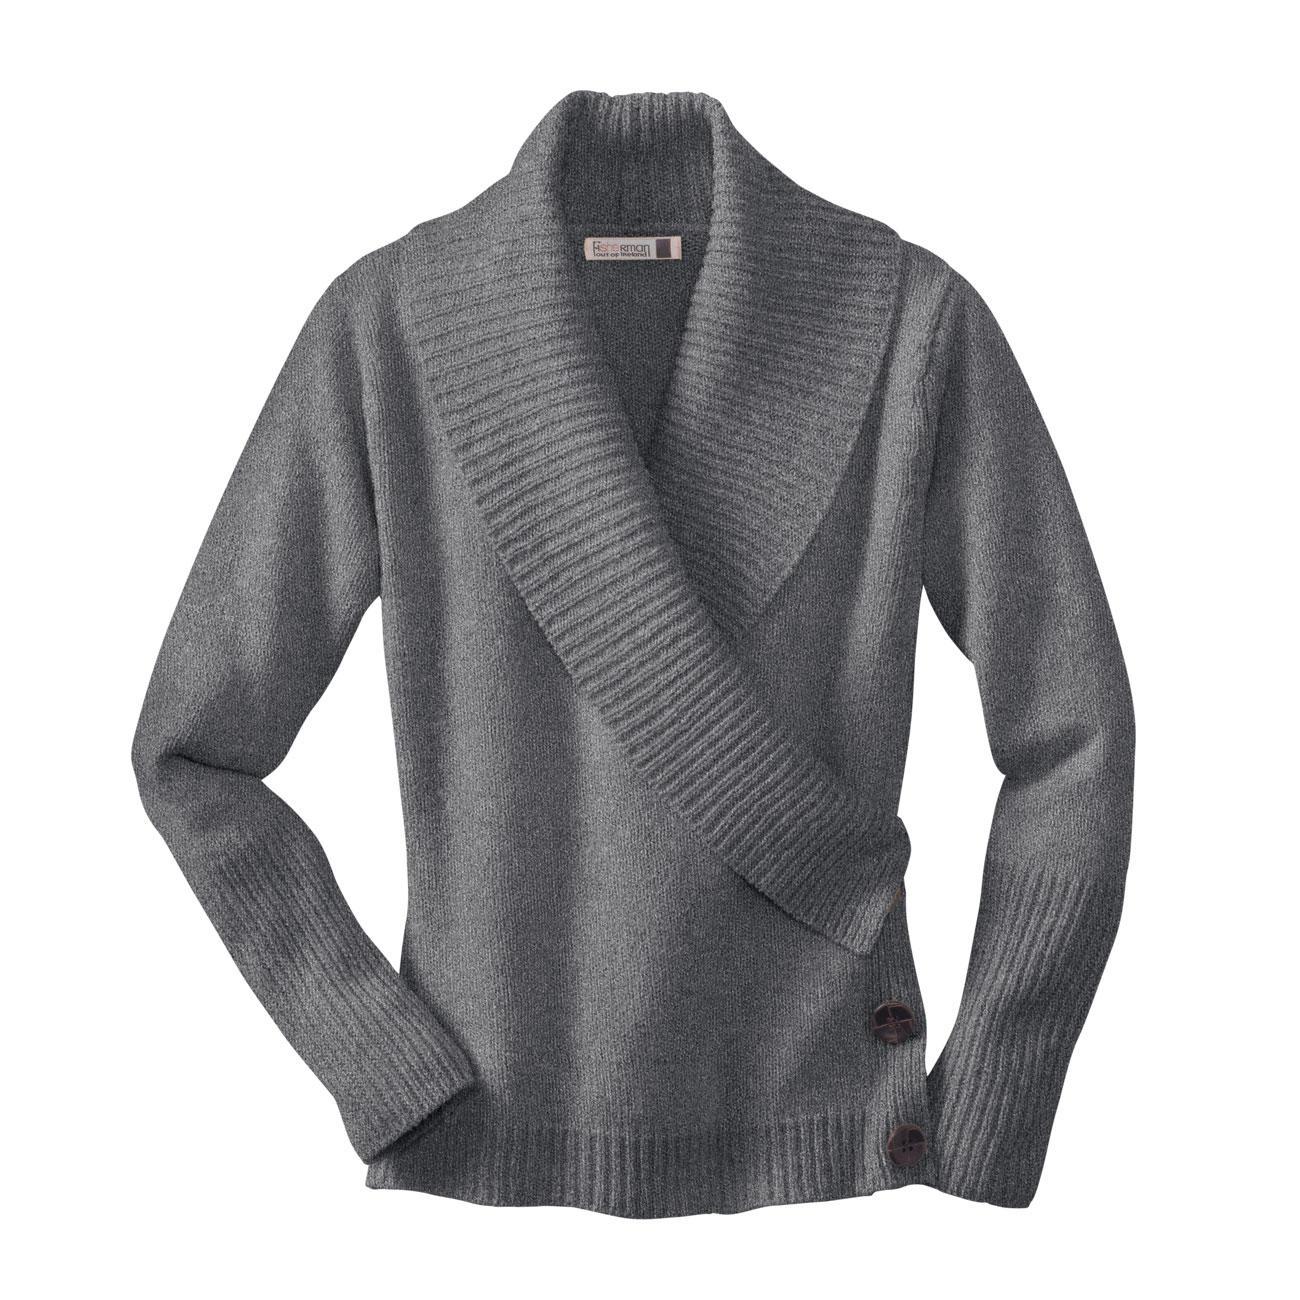 competitive price 5aae4 7495f Fisherman Wickelpullover | Mode-Klassiker entdecken